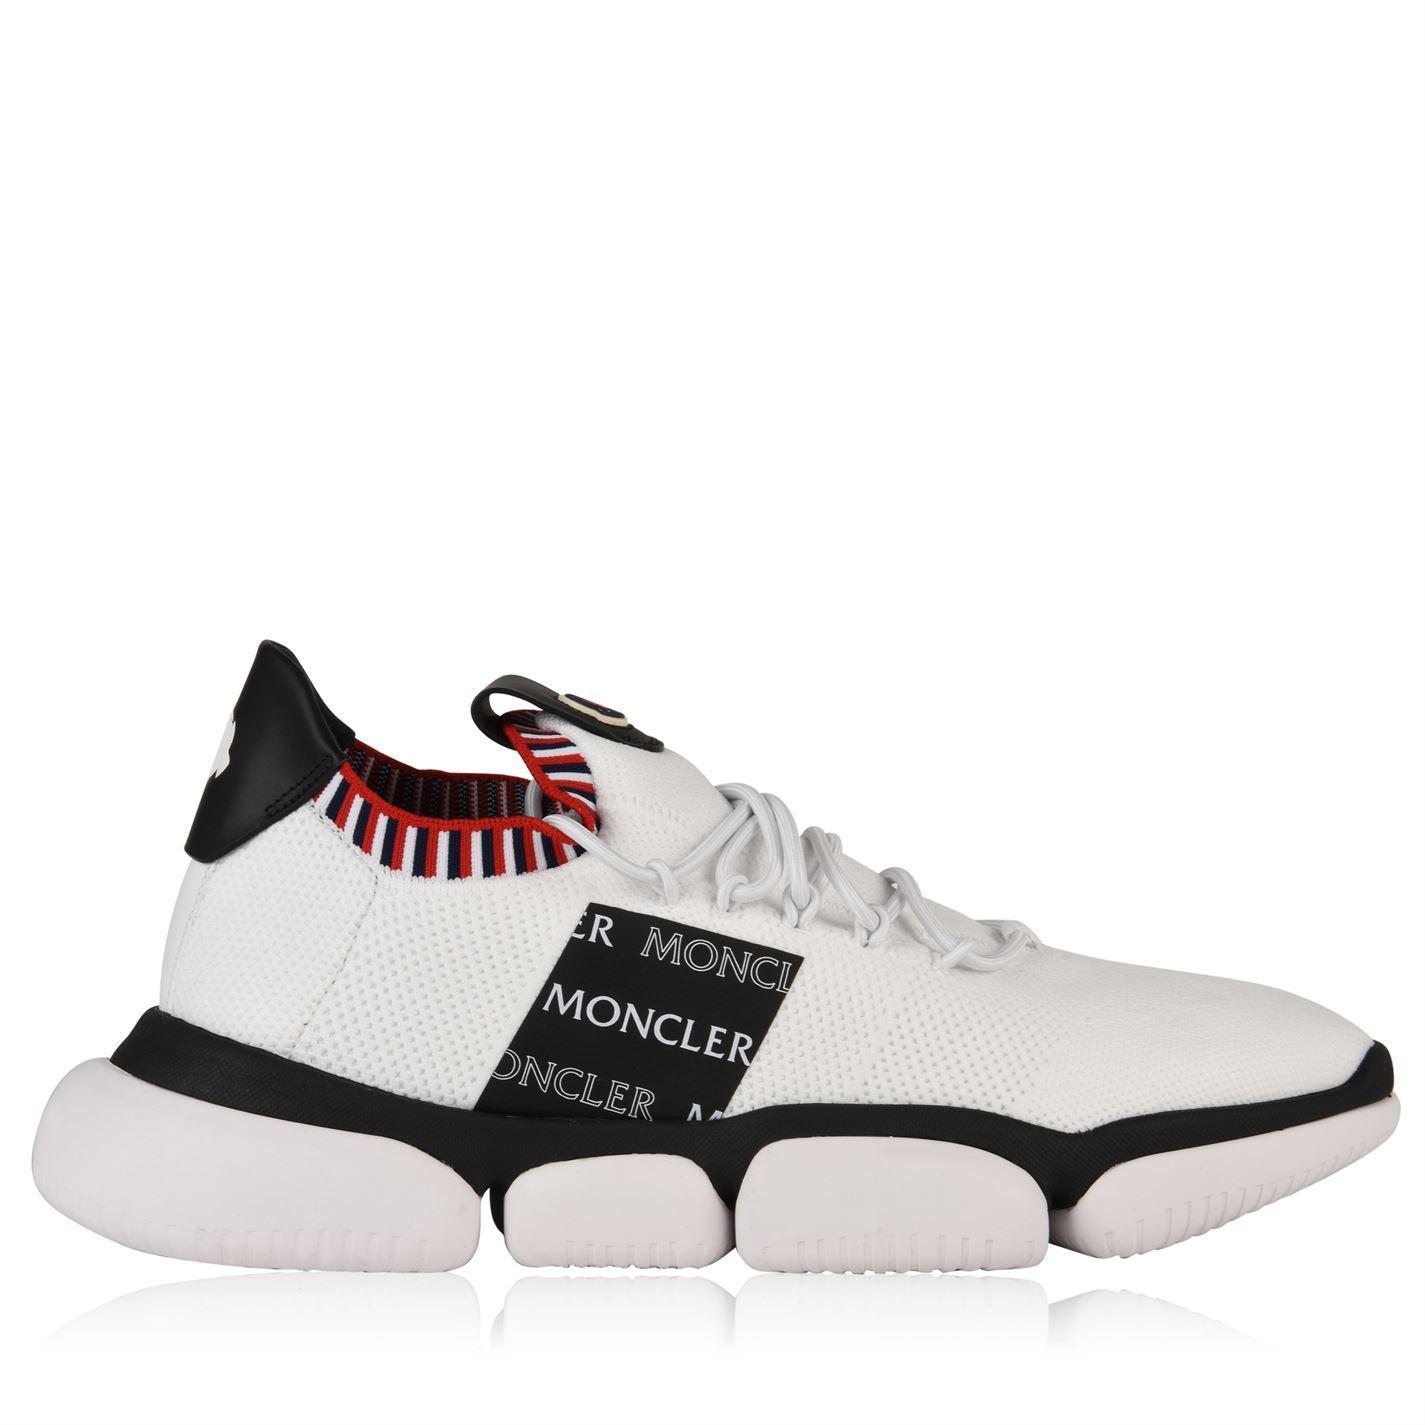 962291bda Lyst - Moncler Knitted Runner Trainers in White for Men